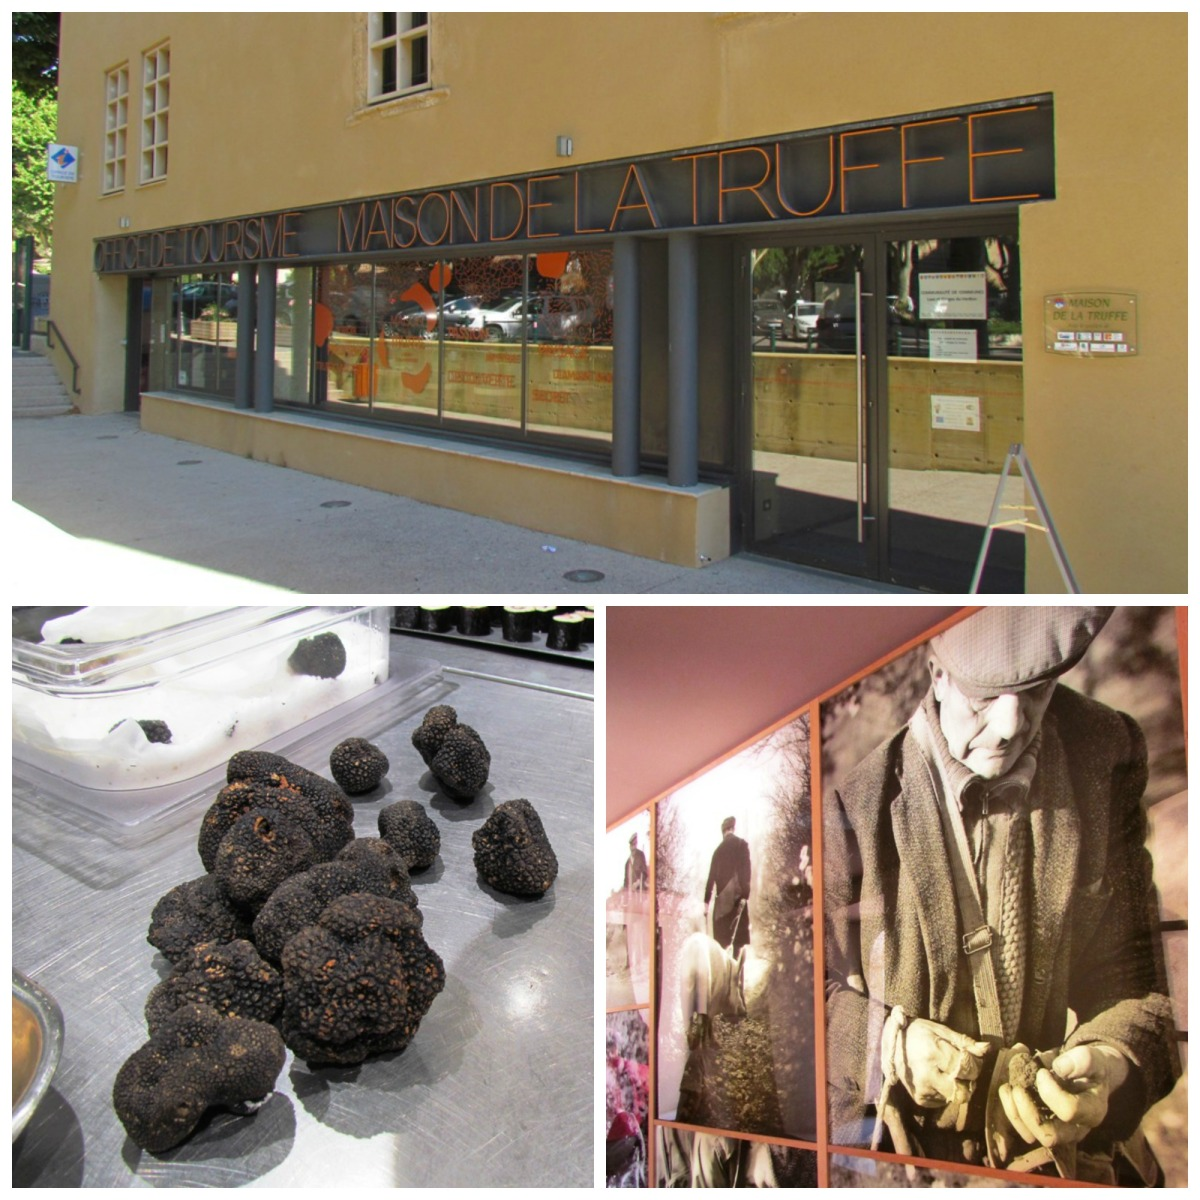 All about truffles at la maison de la truffe in aups - La maison de la truffe ...